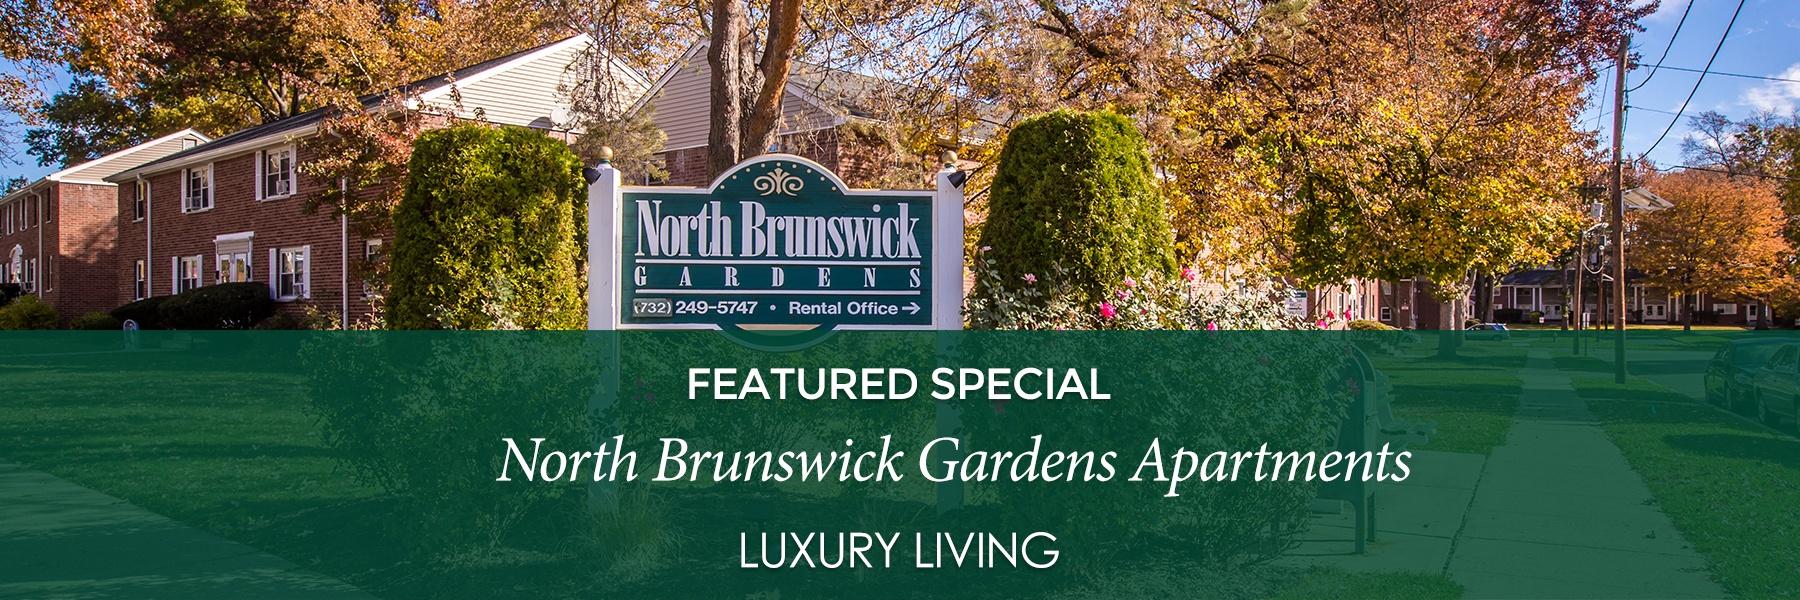 North Brunswick Gardens Apartments For Rent in North Brunswick, NJ Specials